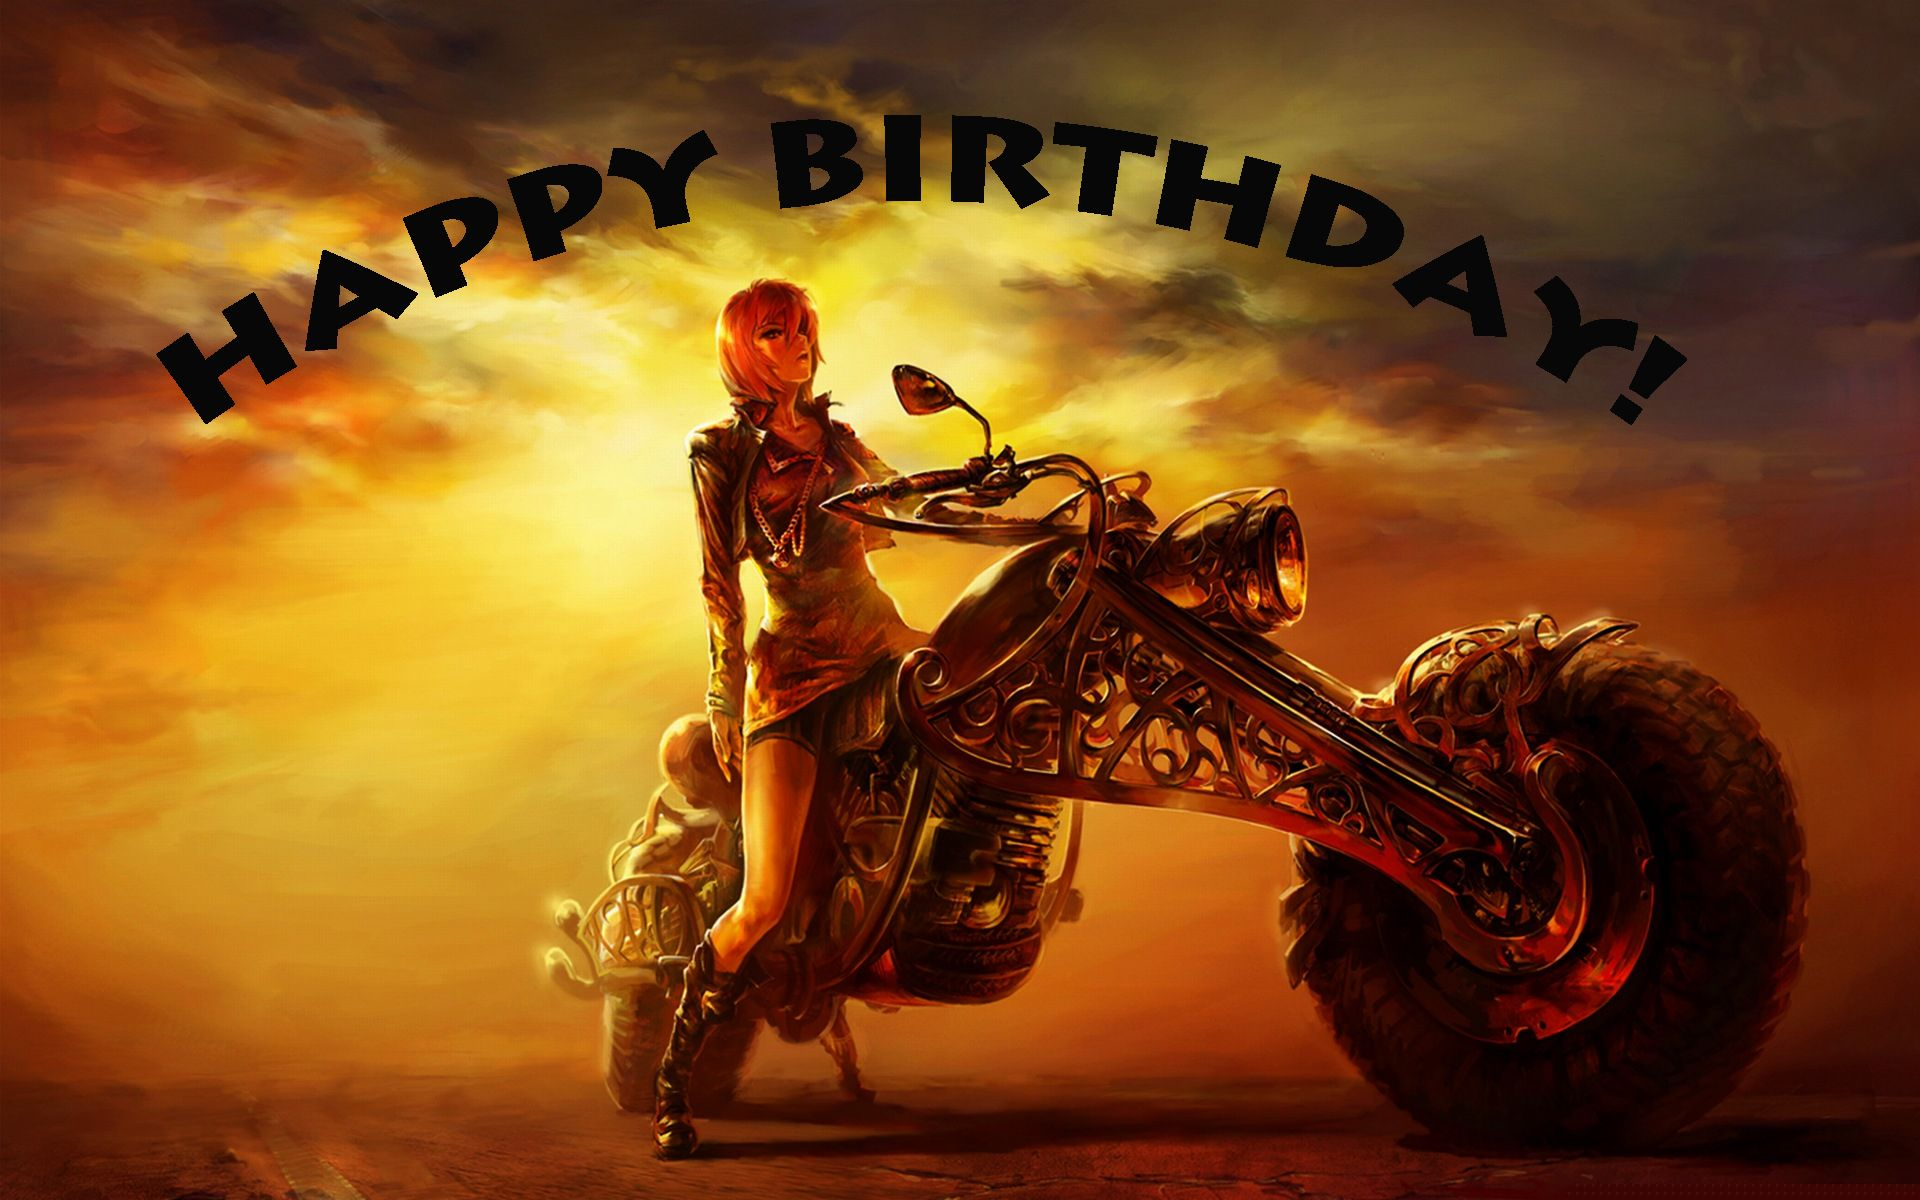 Happy Birthday Biker chick HipHip Leuke prenten